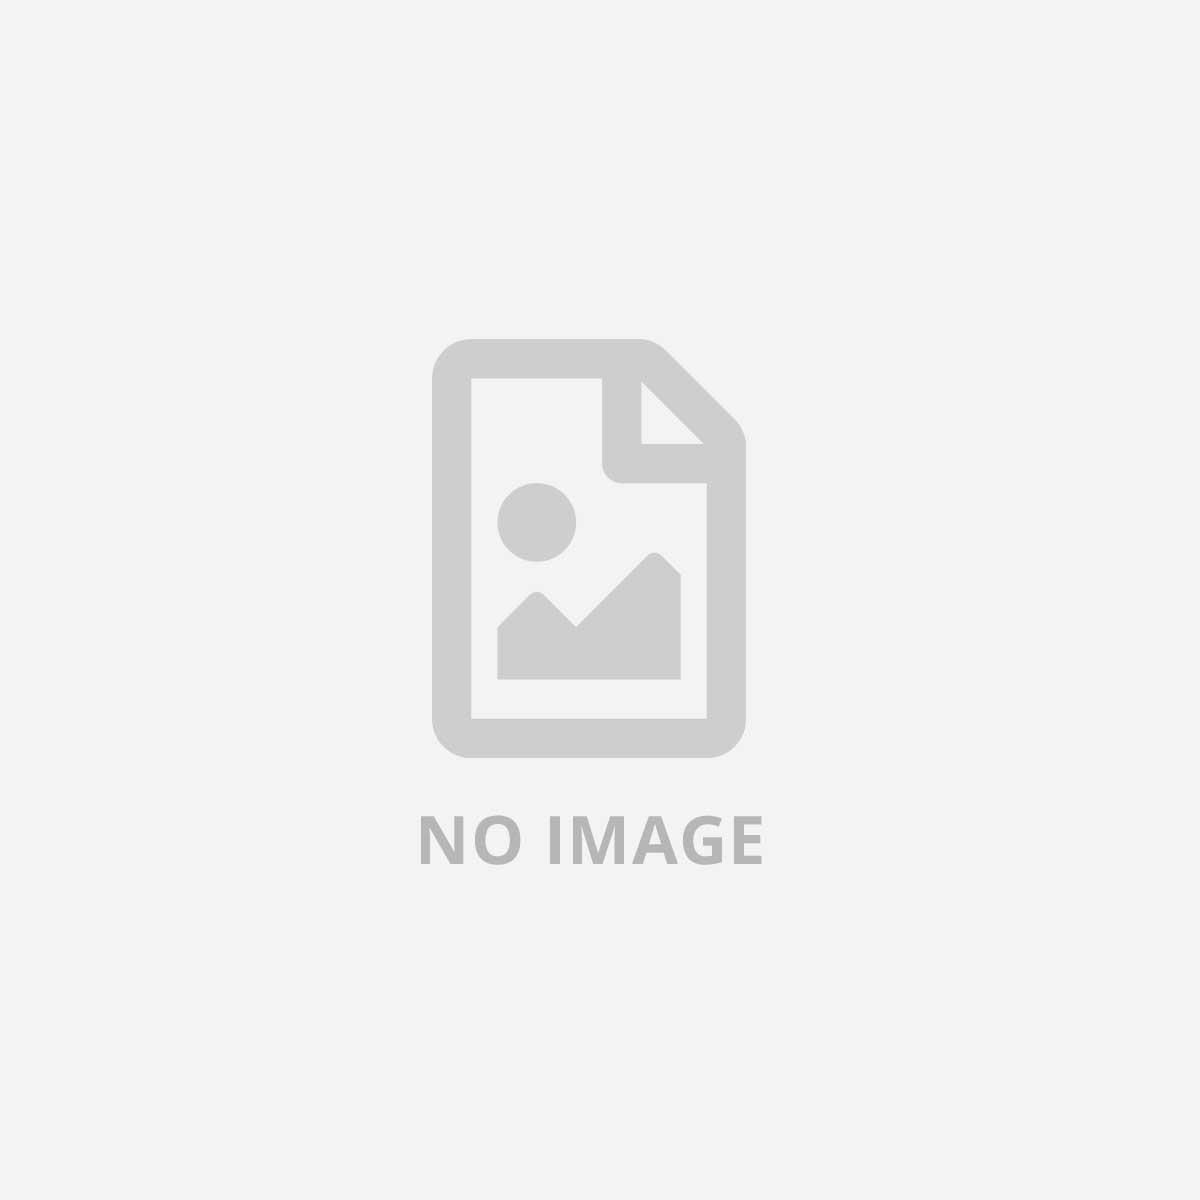 IBM EMULEX 16GB FC SINGLE-PORT